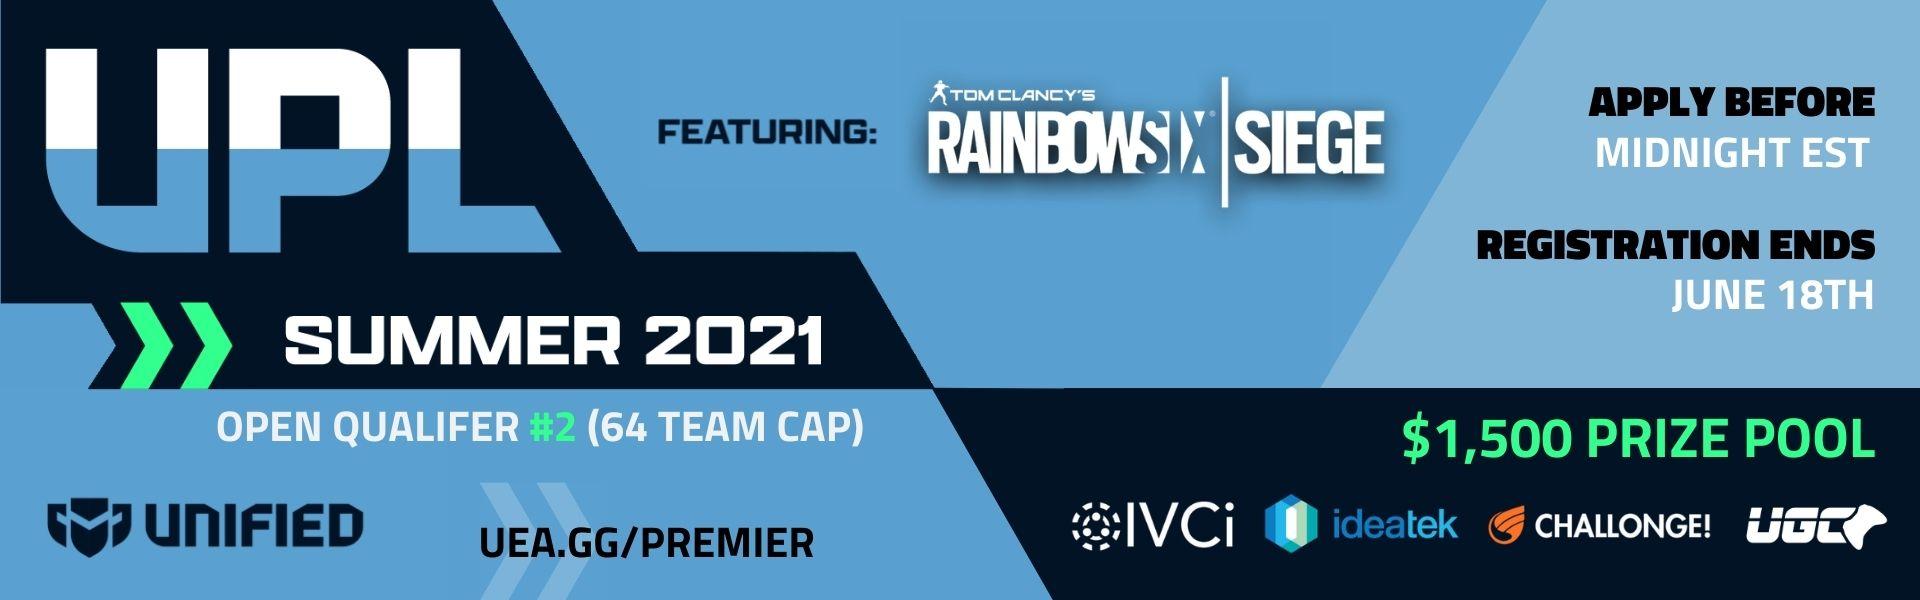 Unified Rainbow Six Open Qualifier 2